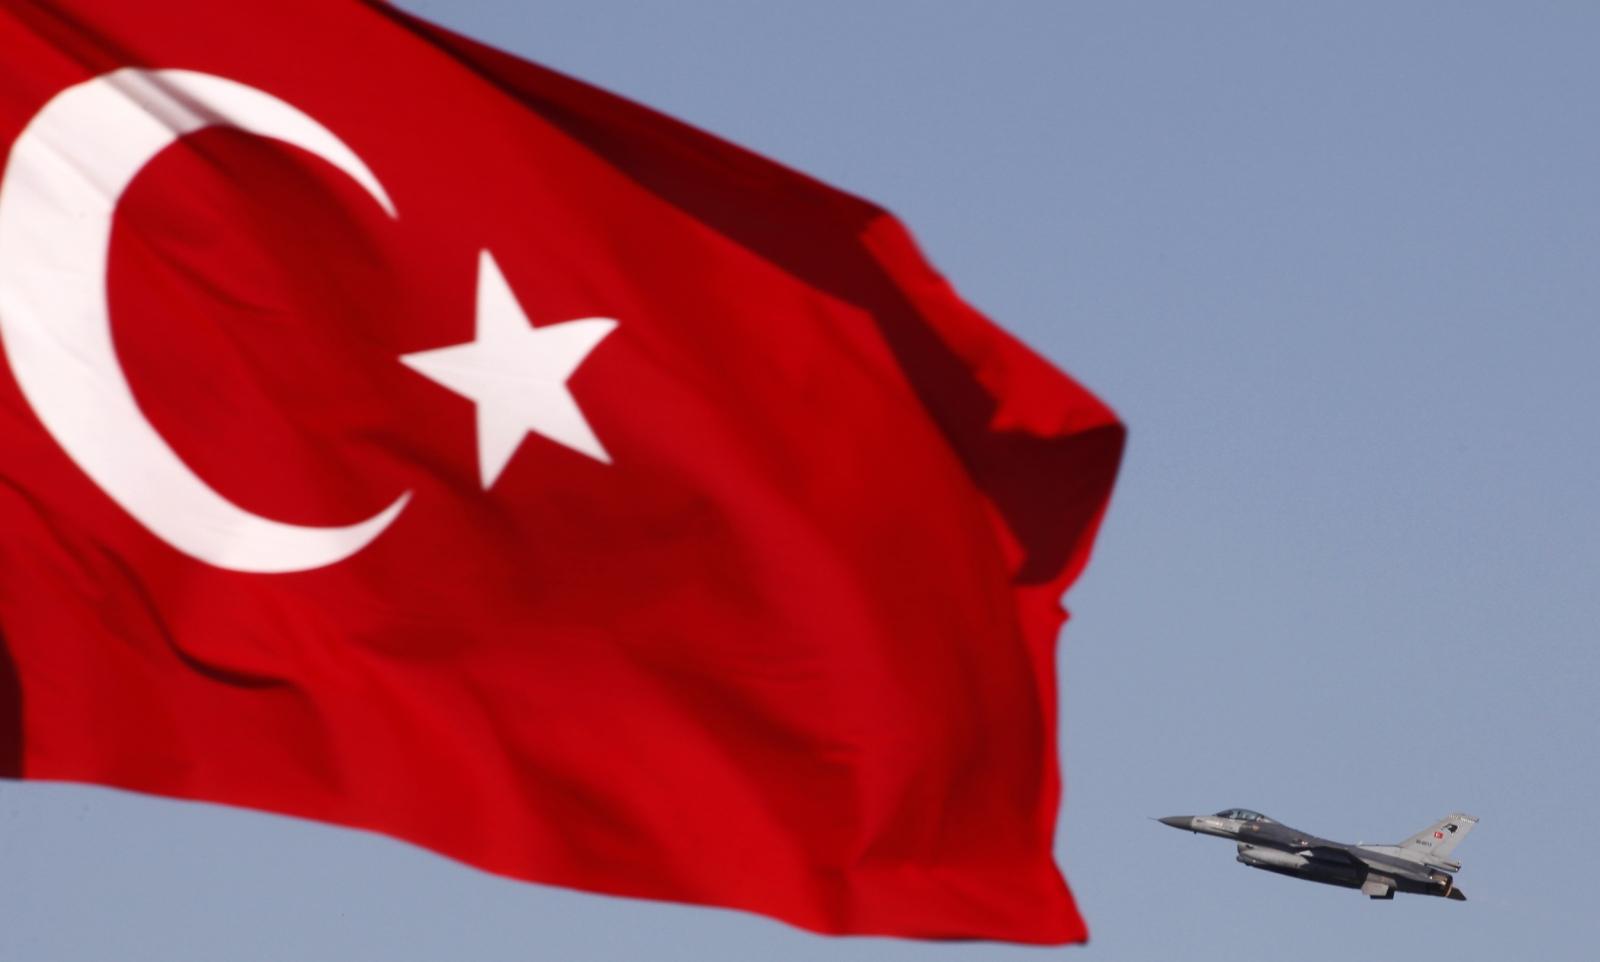 Turkey Bombs PKK Kurdish Rebels amid ISIS Kobani Crisis